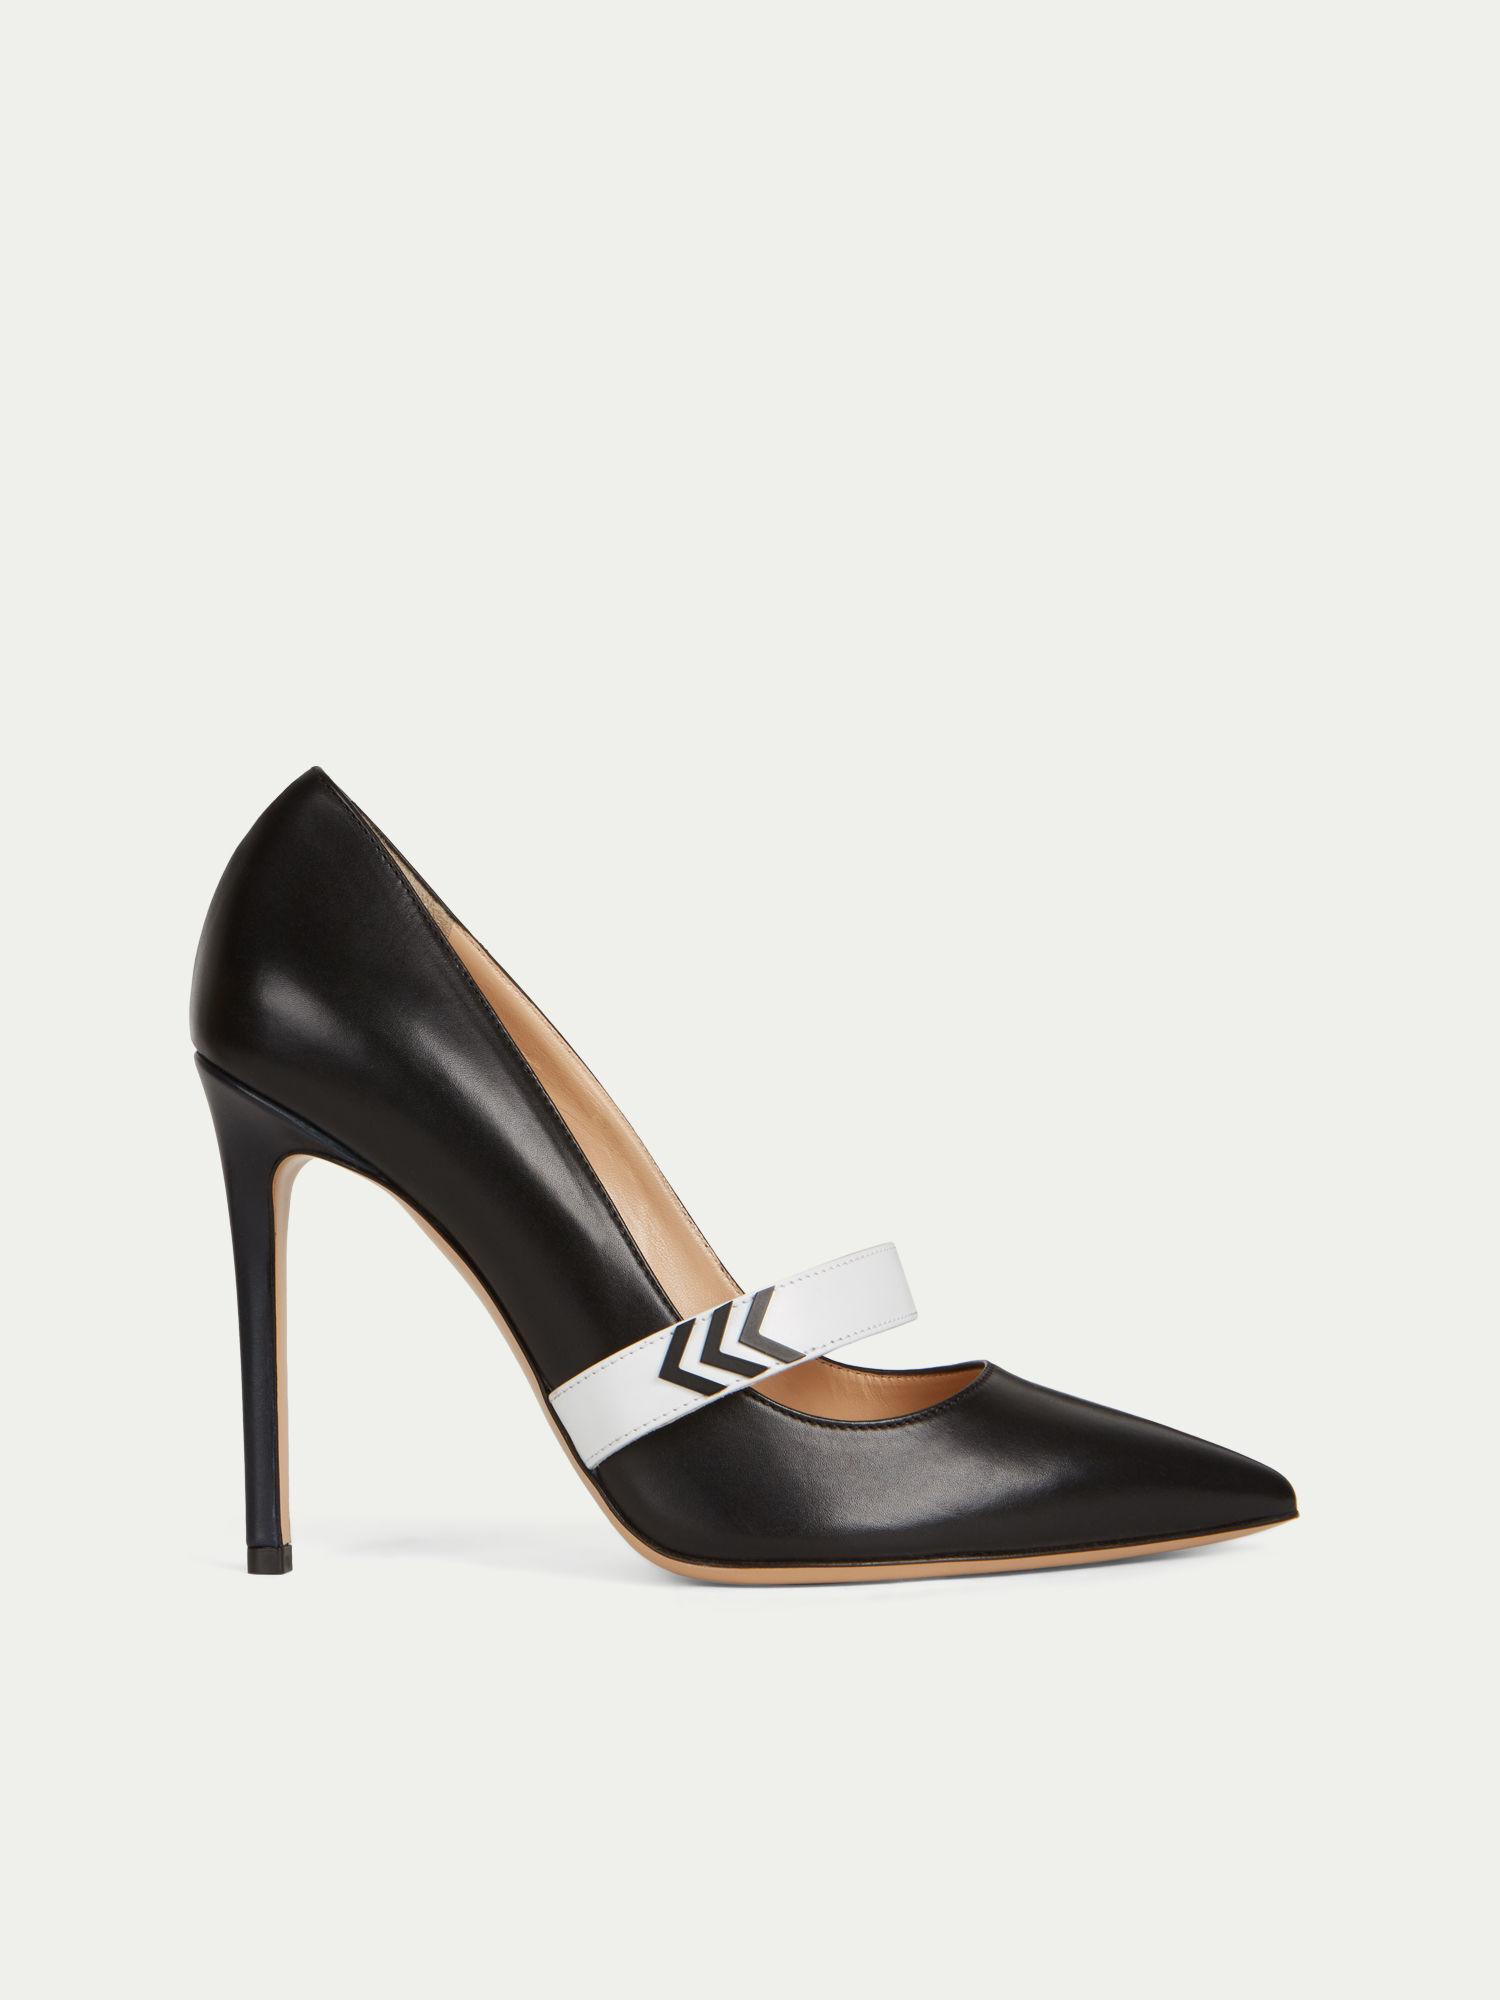 ® FemmesTrussardi ® Chaussures Pour Pour FemmesTrussardi Chaussures zpSMVUq